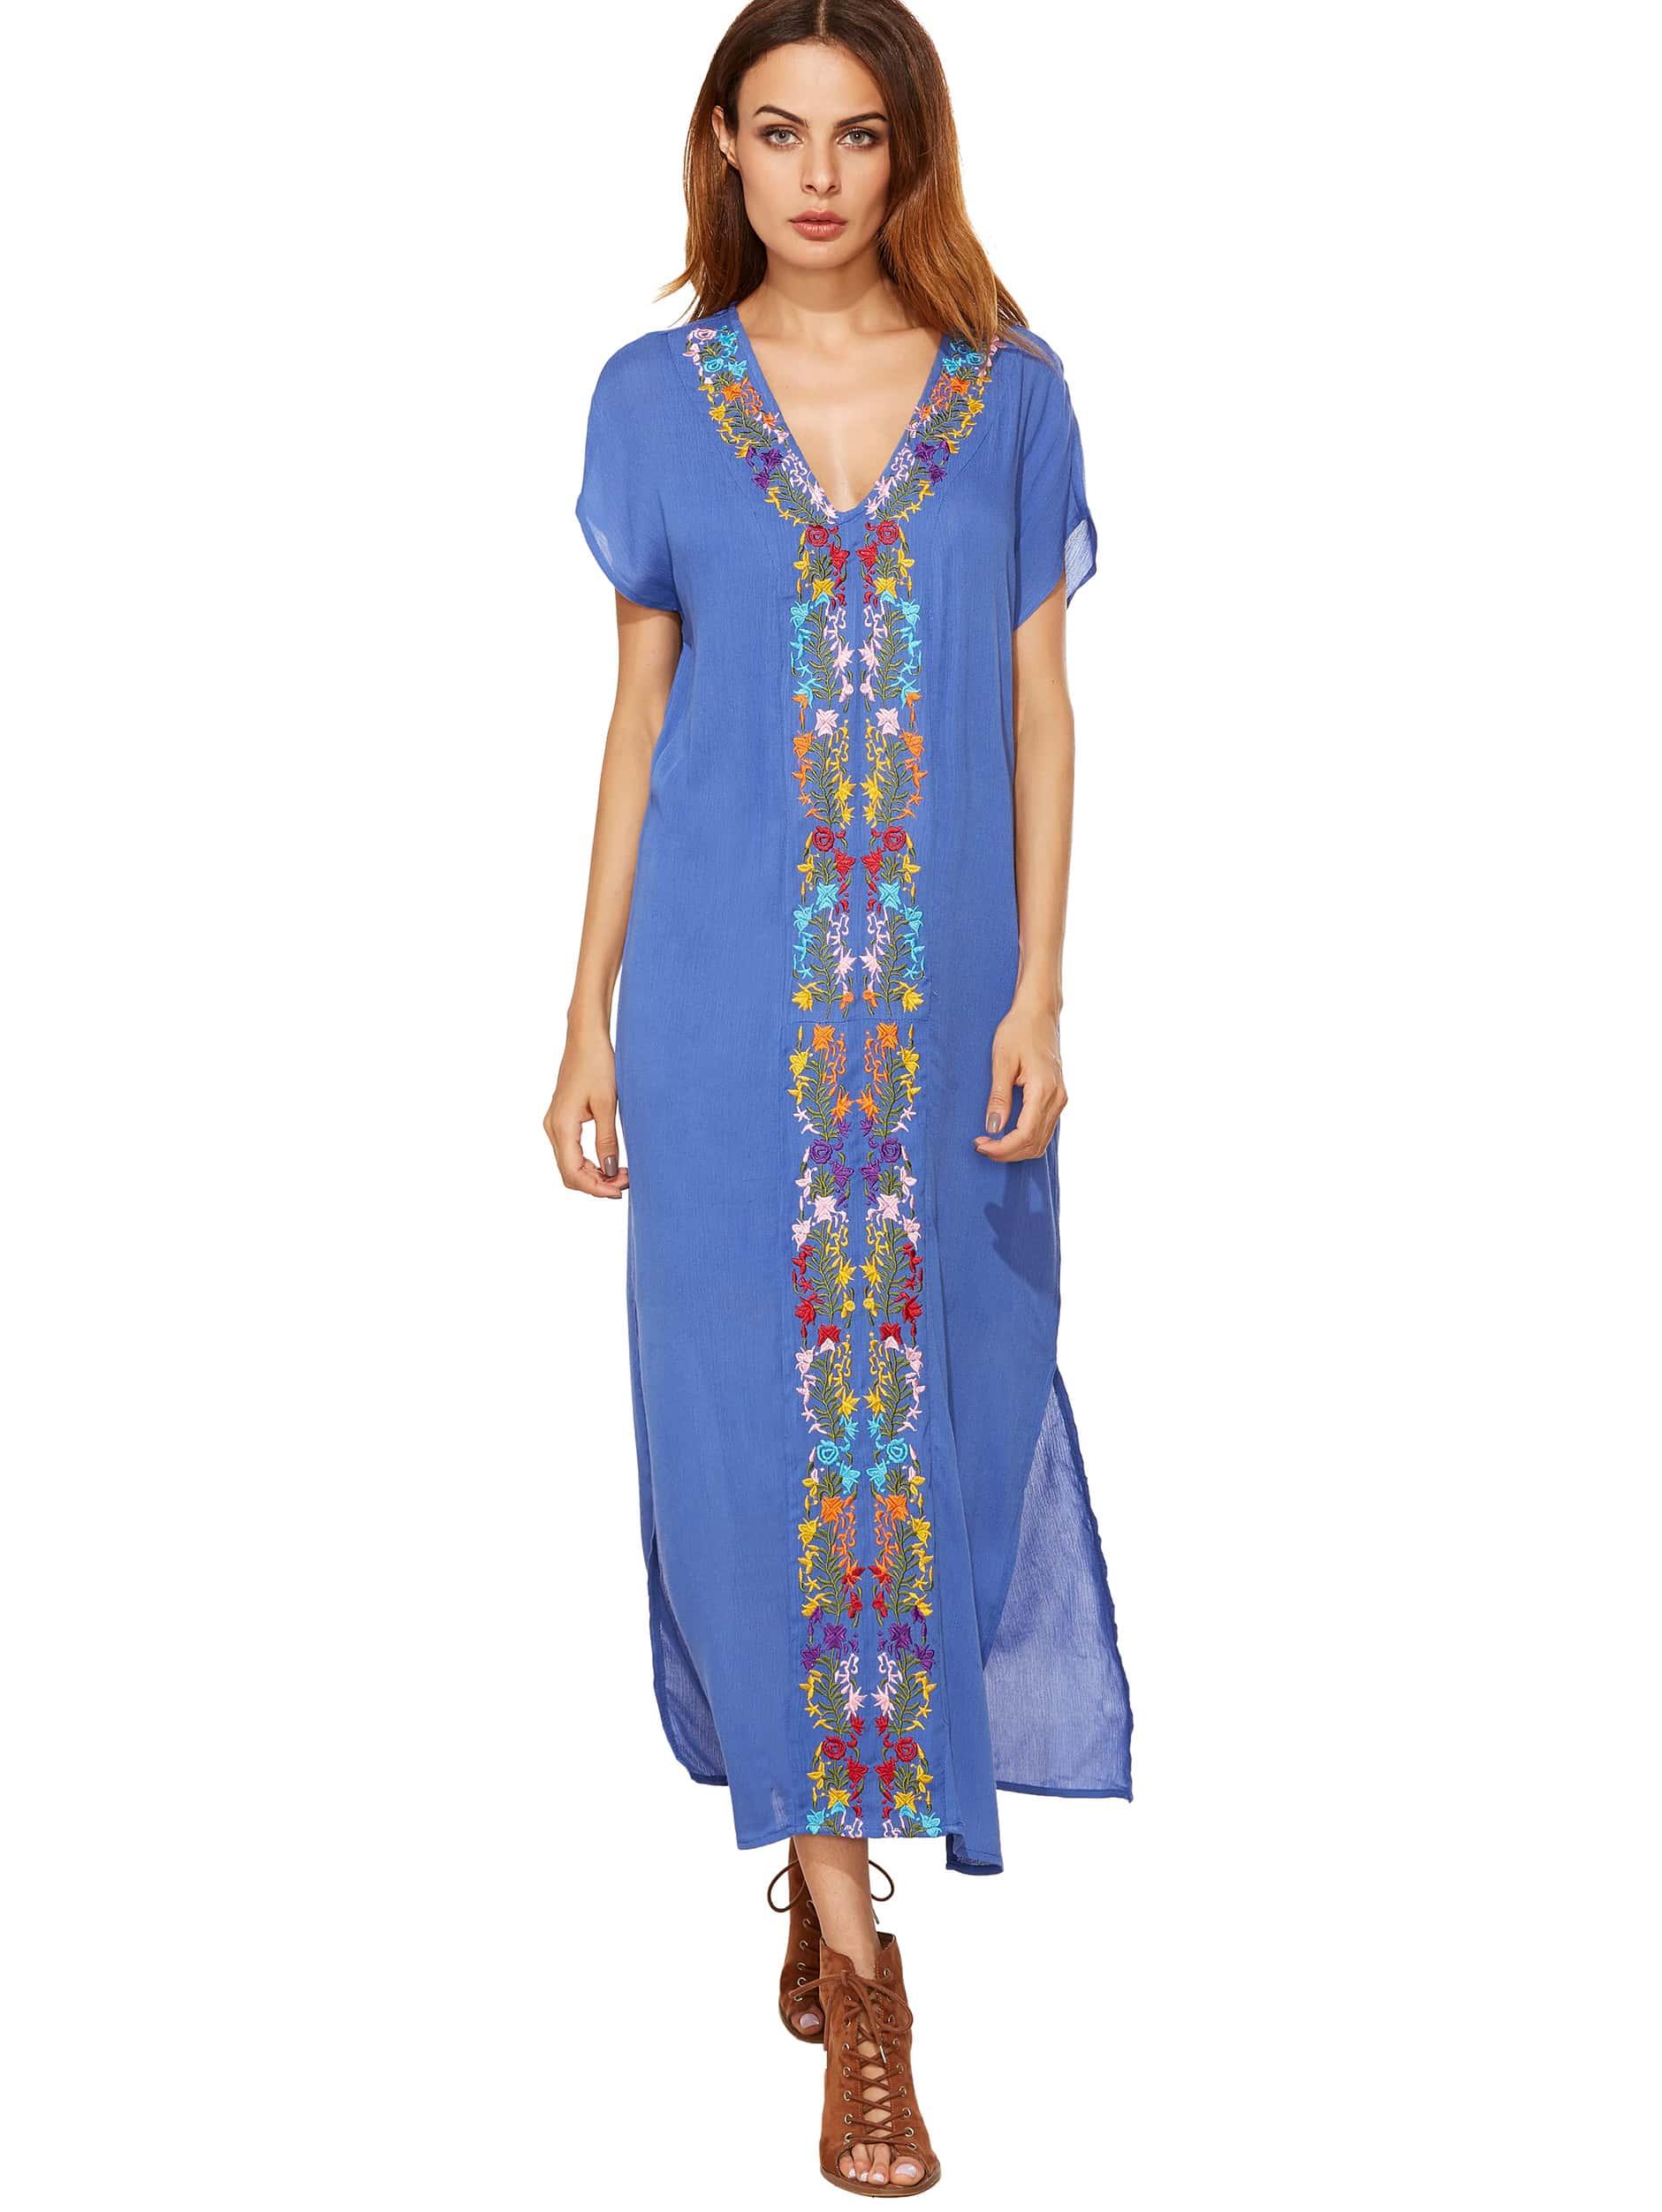 Blue Placement Print Split Side Maxi Dress dress160905597